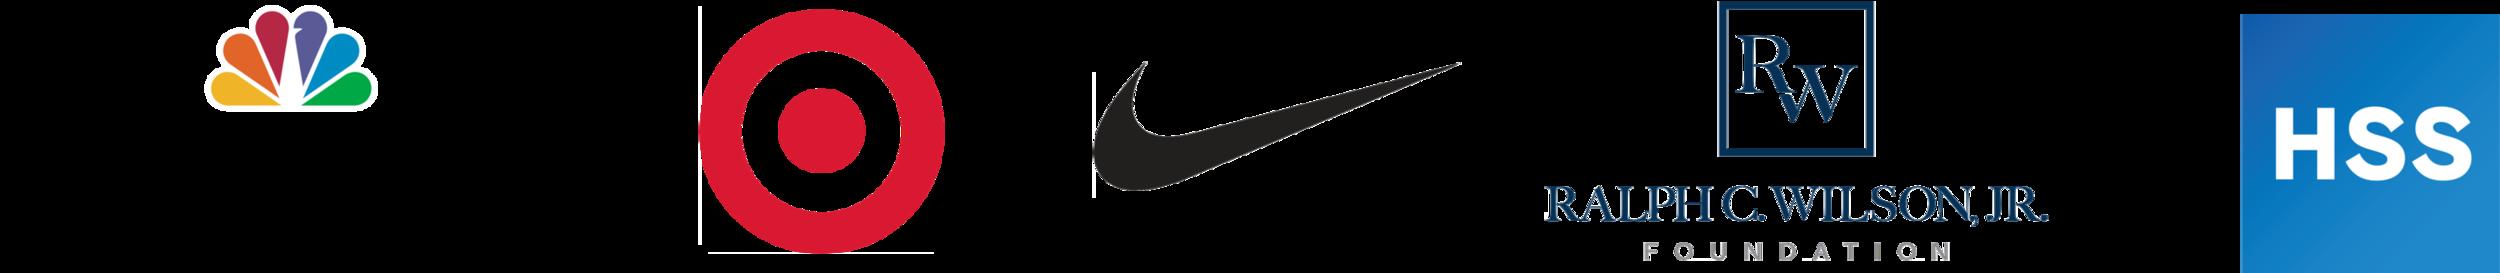 Summit Sponsor Logo Group.png